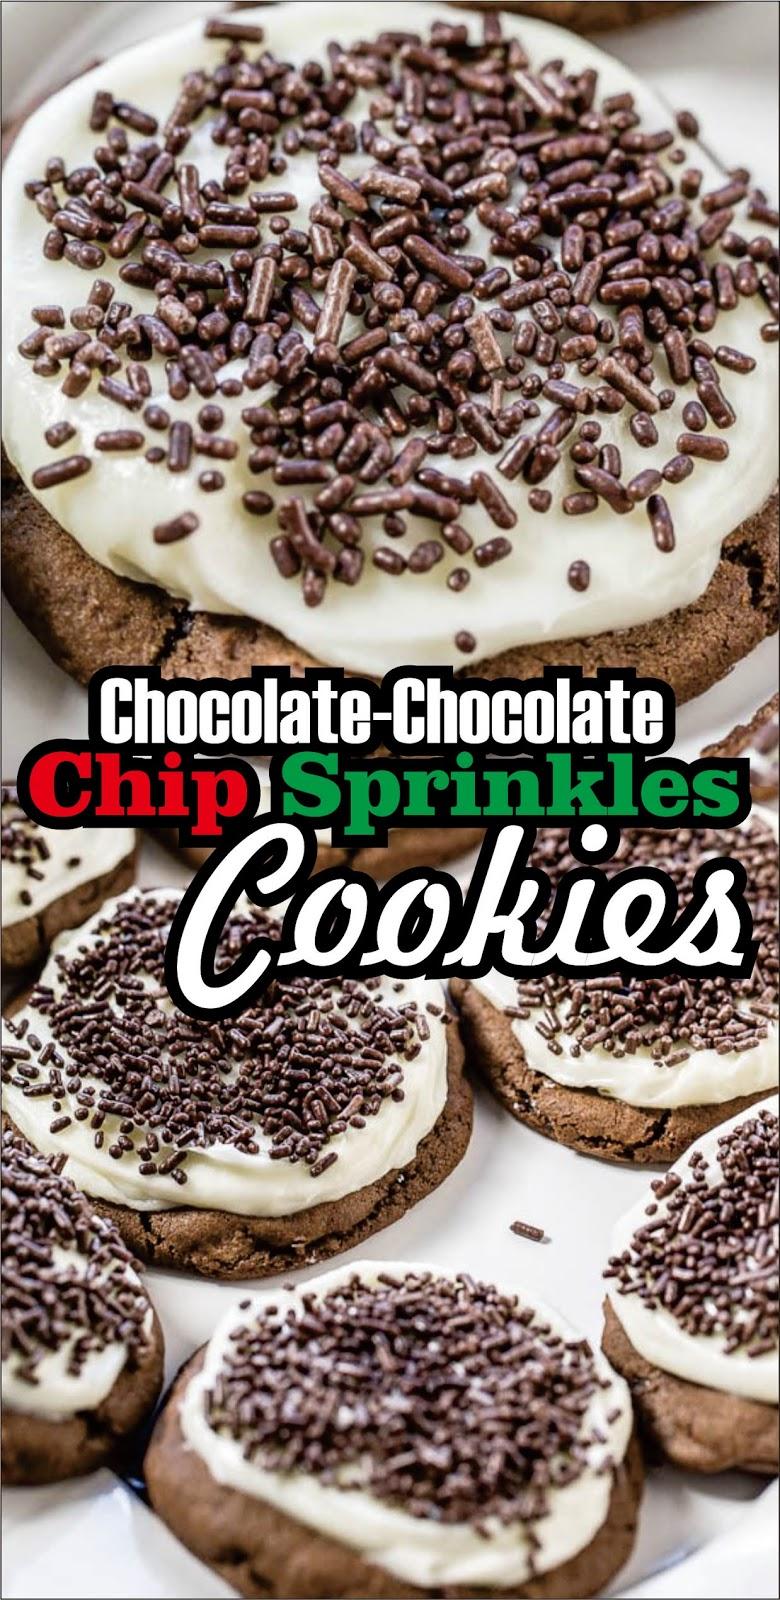 Chocolate-Chocolate Chip Sprinkles Cookies - Easy Kraft Recipes